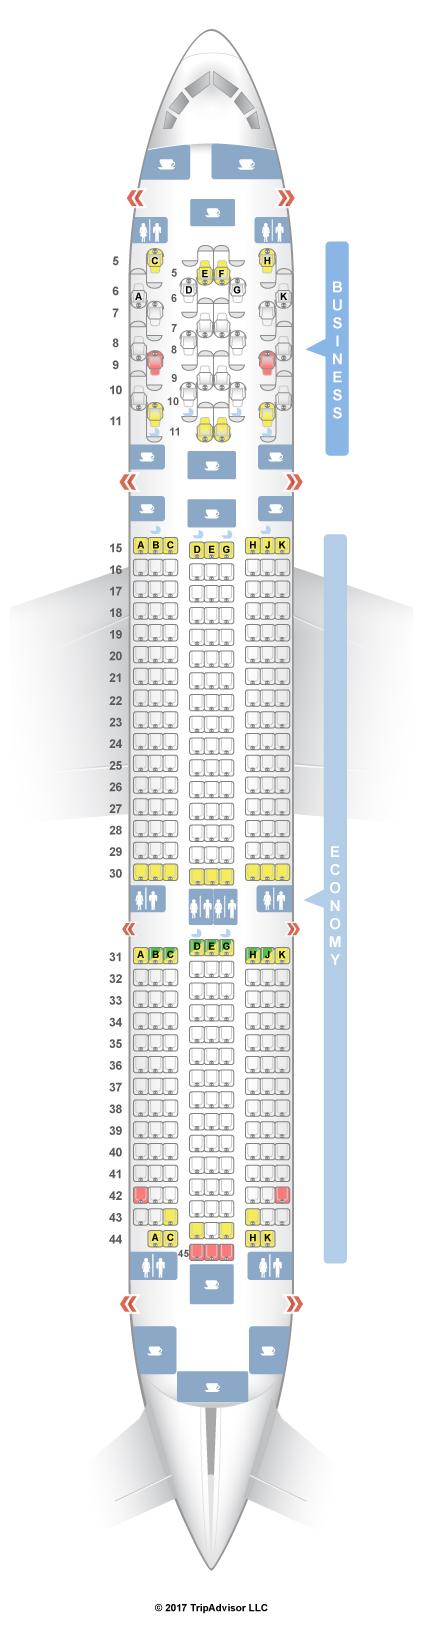 seatguru seat map etihad boeing 787 9 789 v2